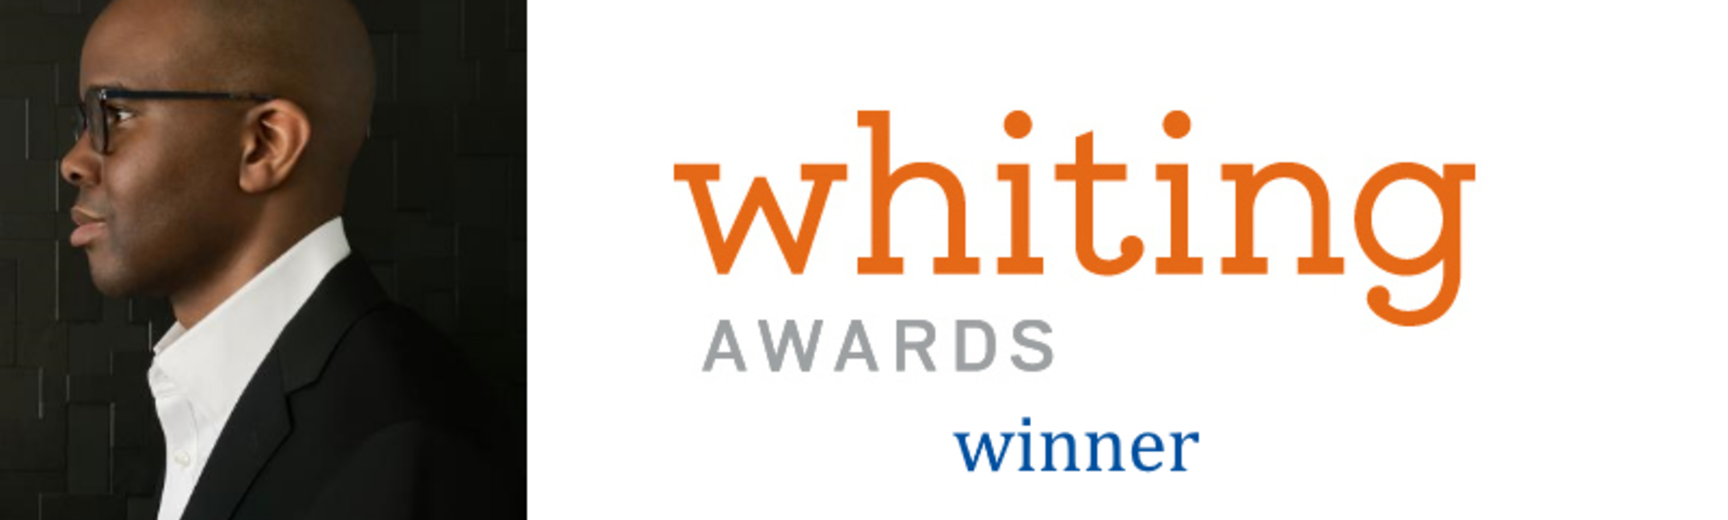 whiting awards banner